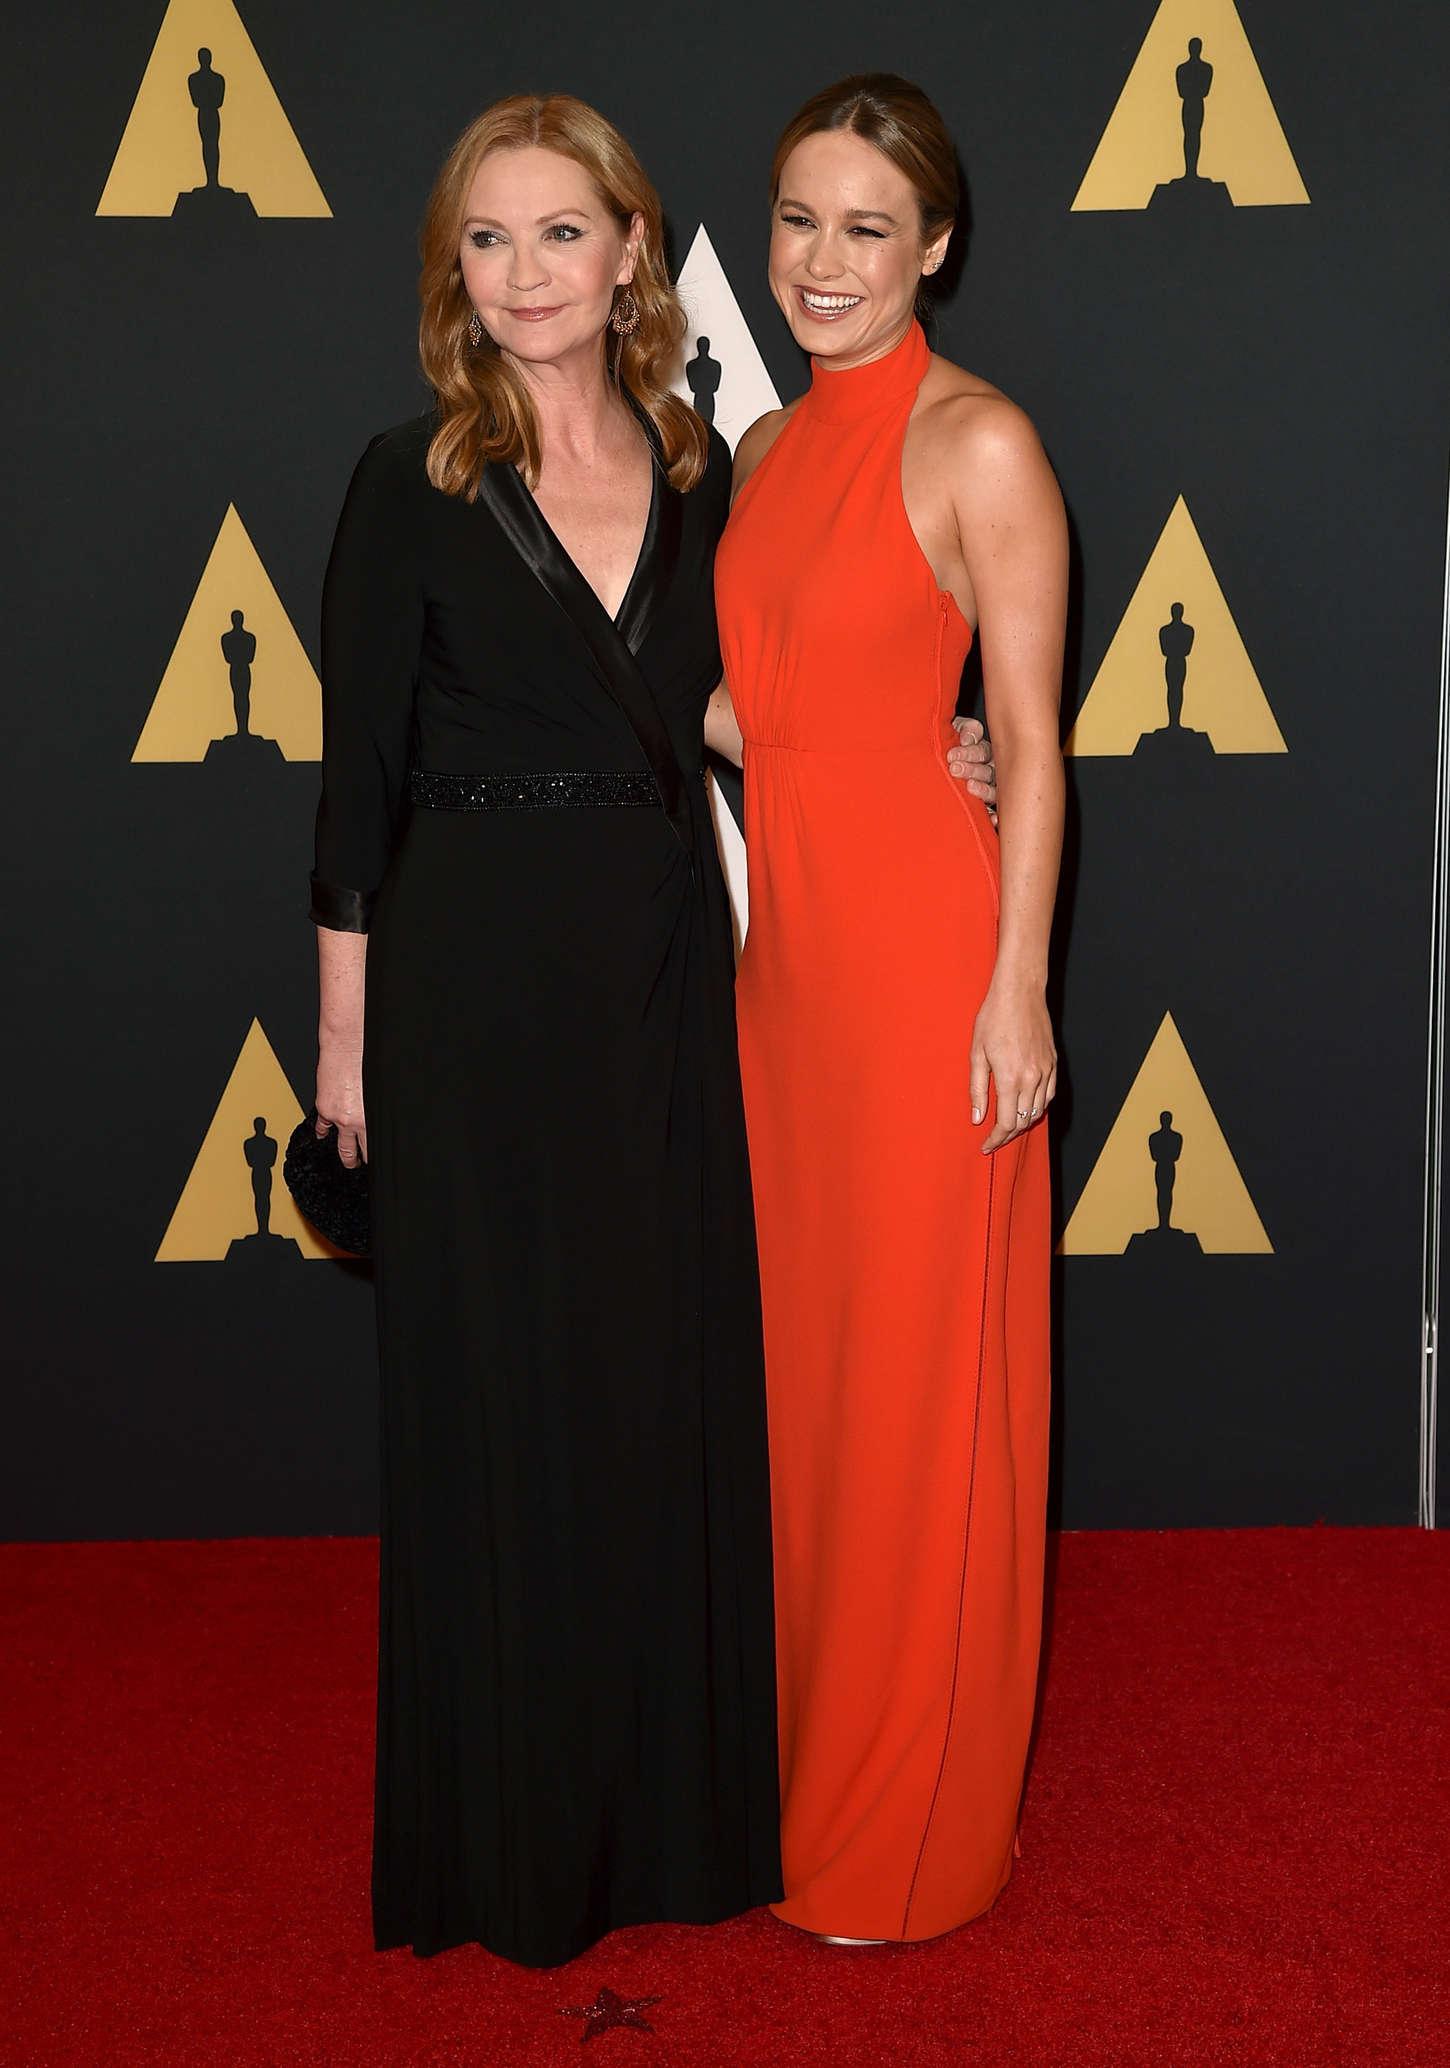 Brie Larson 2015 : Brie Larson: Governors Awards 2015 -02